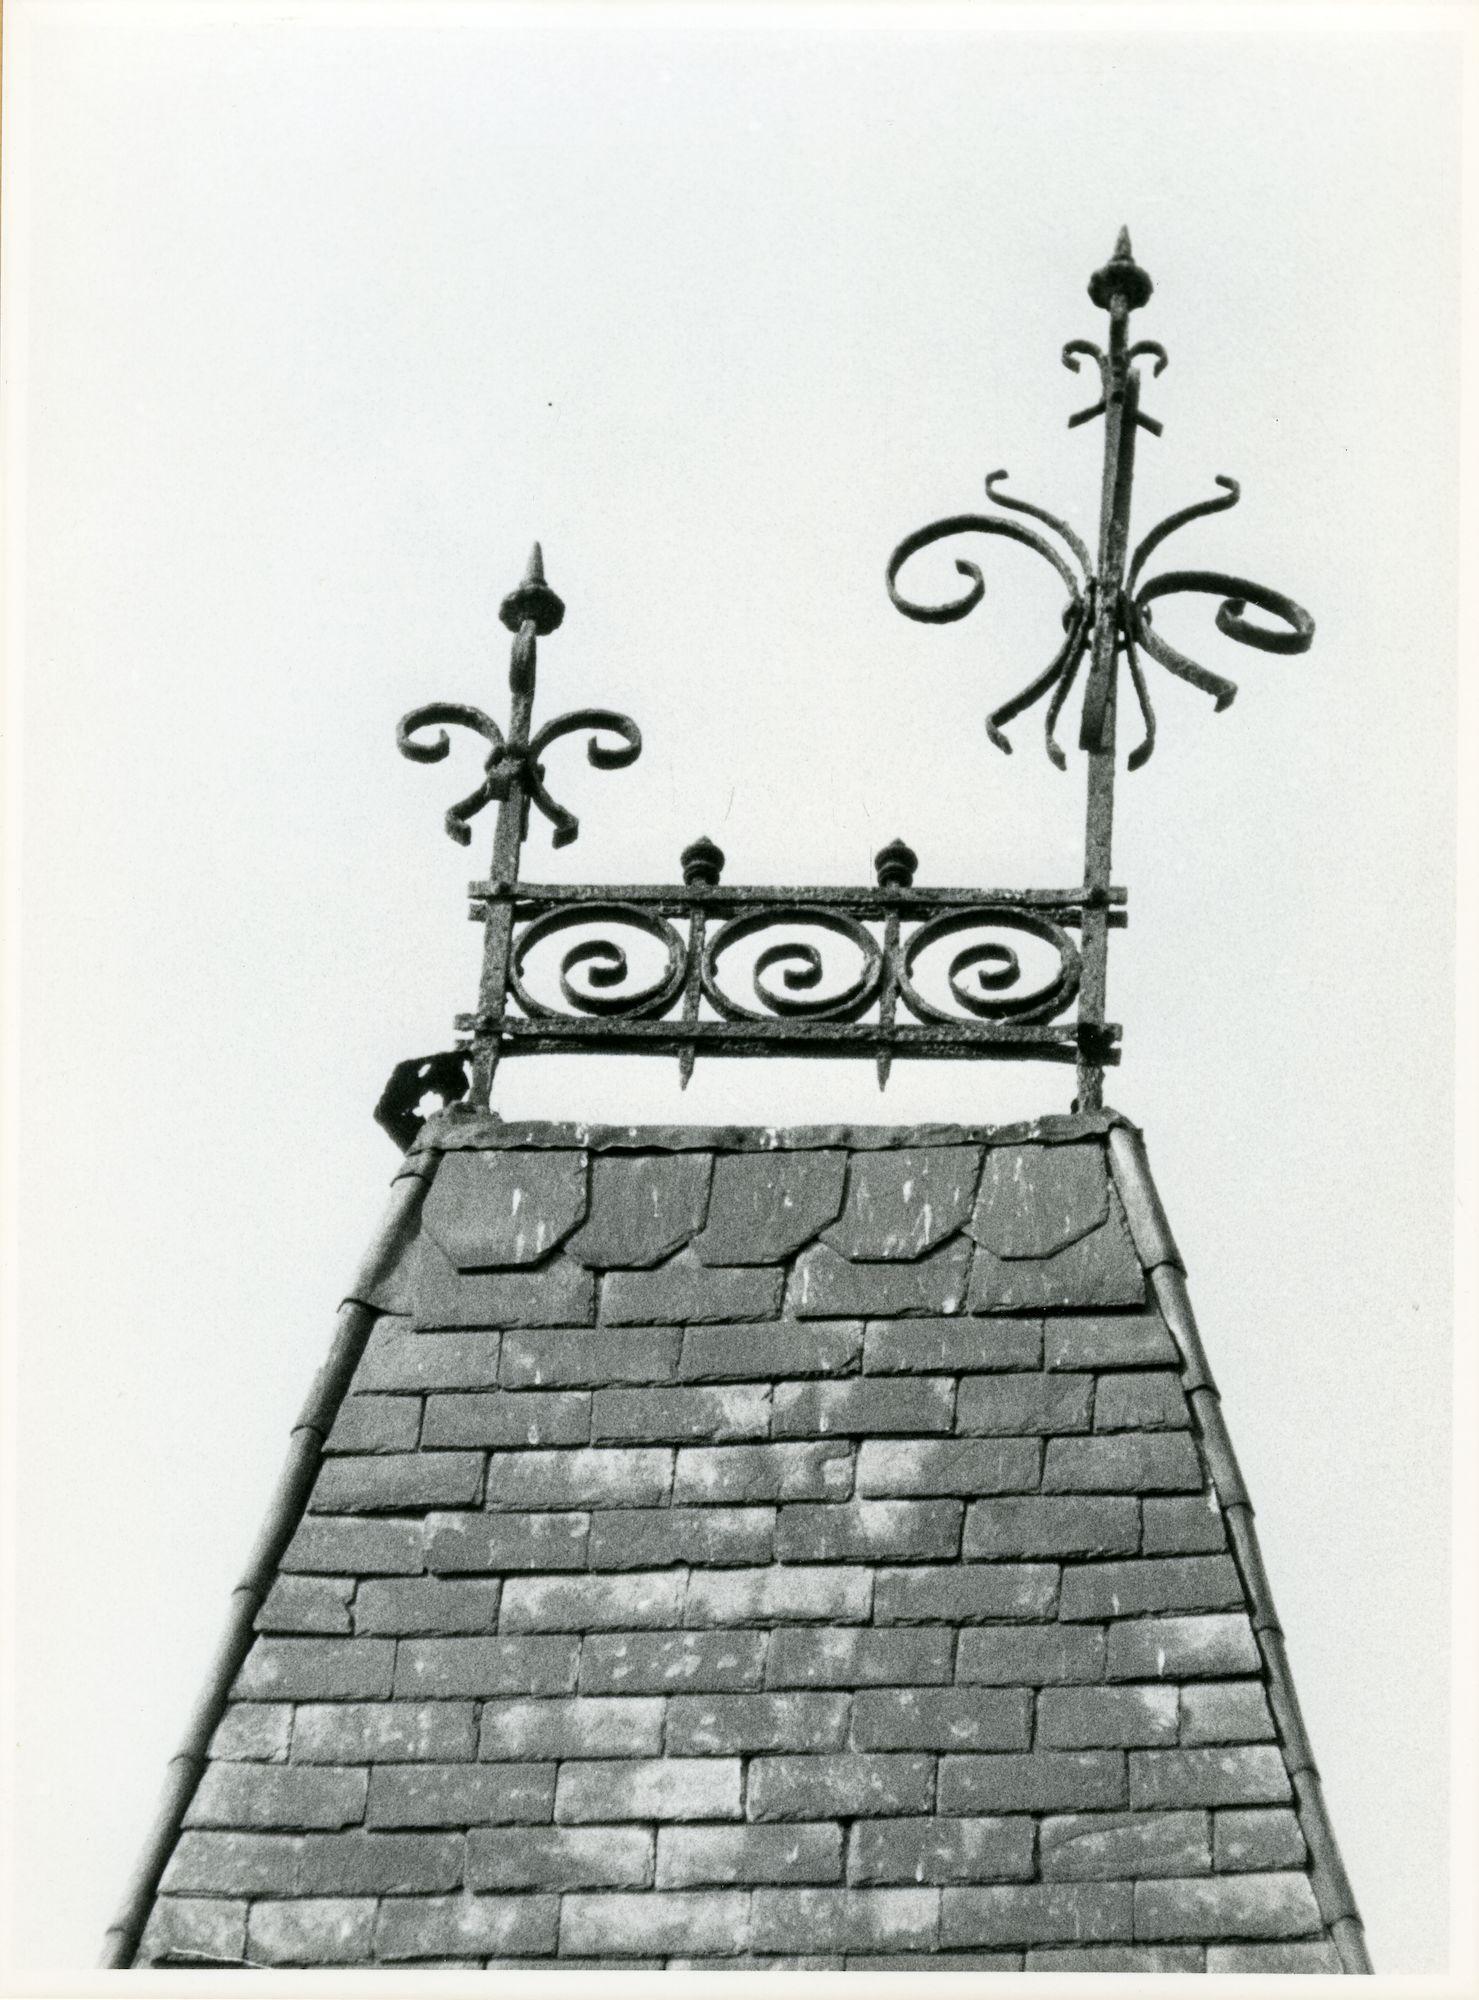 St.-Amandsberg: Bloemistenstraat 32: Nokversiering, 1979